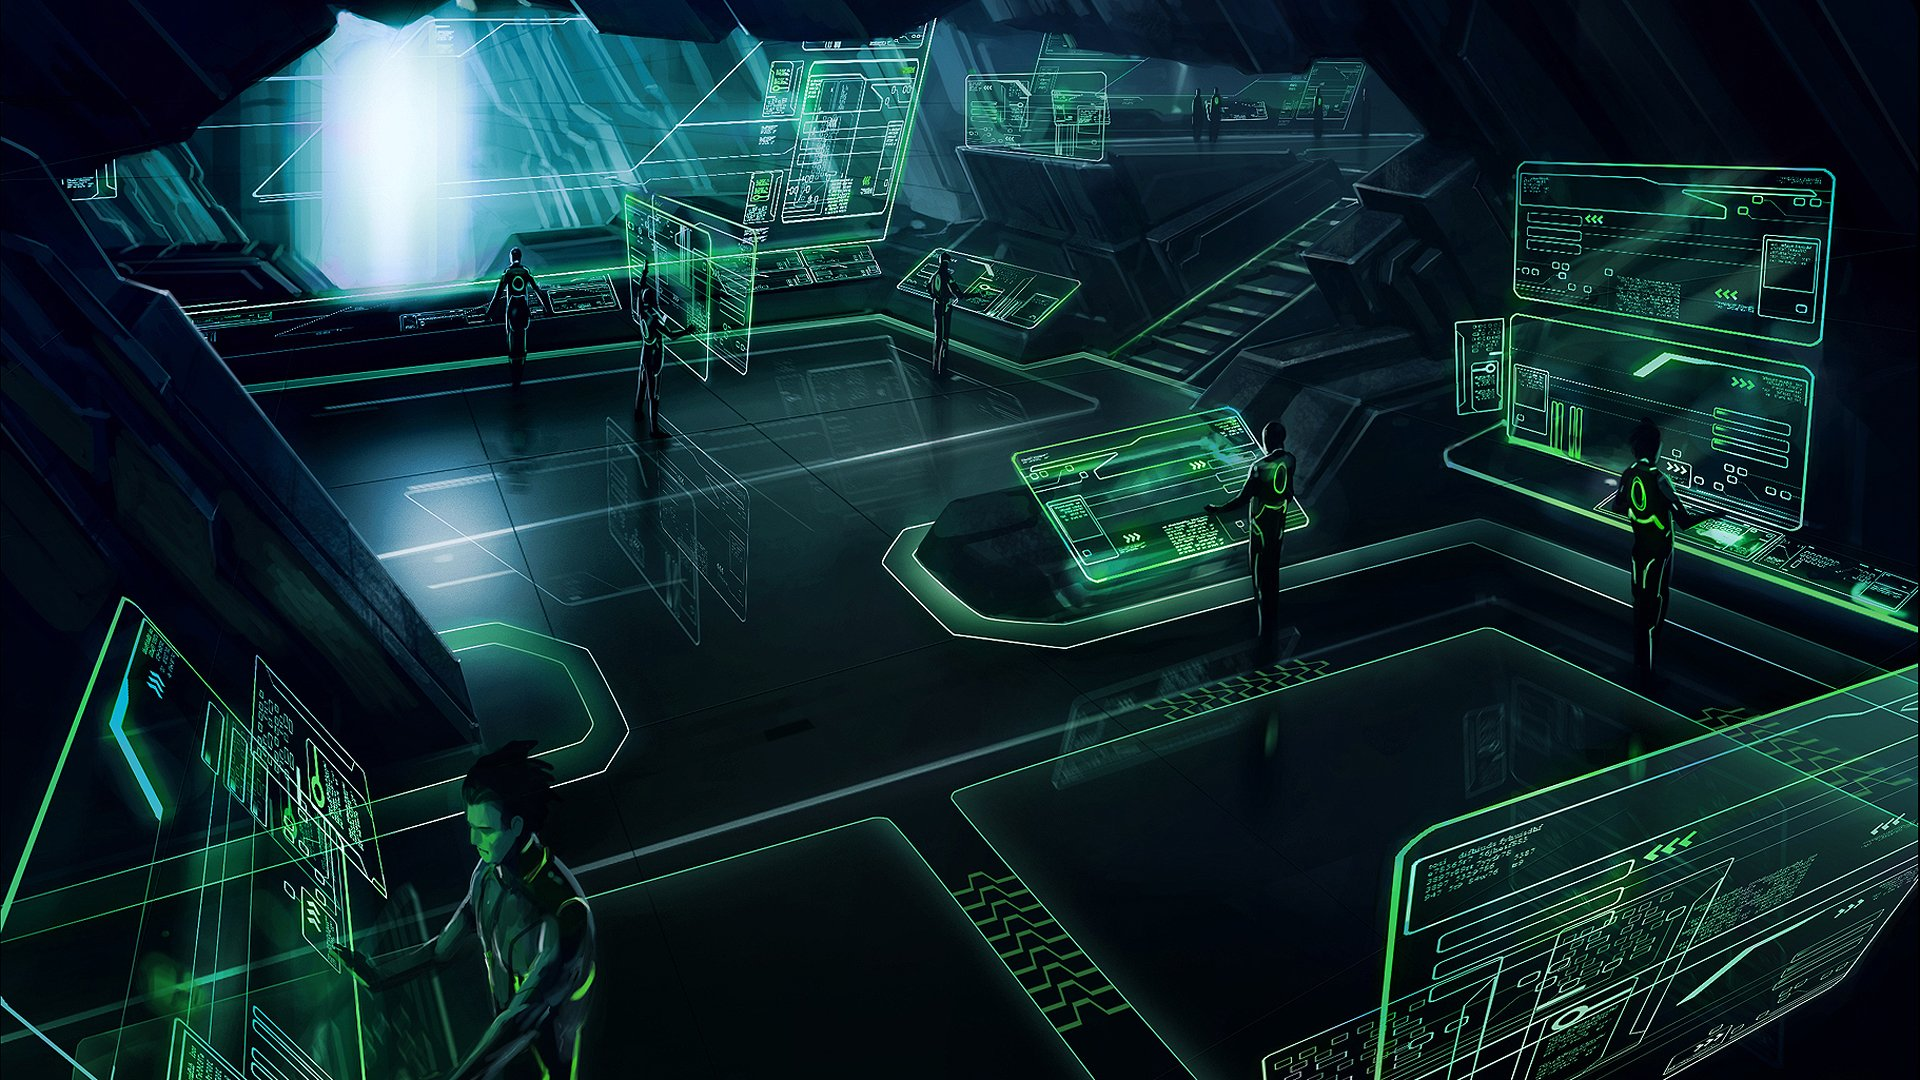 General 1920x1080 Tron Tron: Legacy green dark digital art